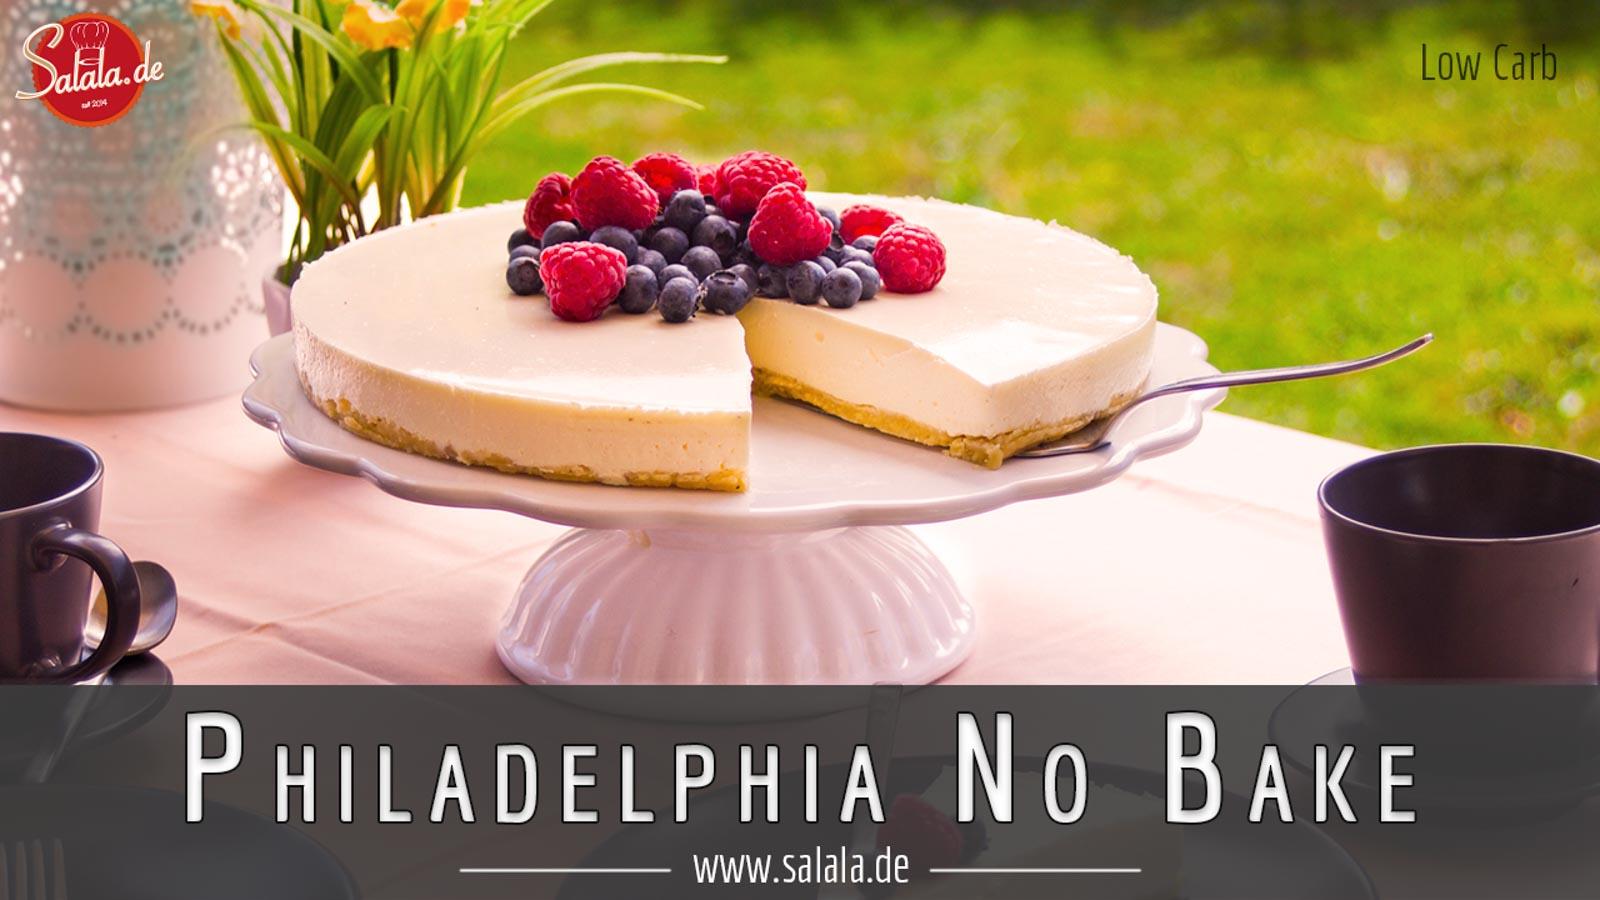 Philadelphia Torte No Bake Low Carb Salala De Low Carb Mit